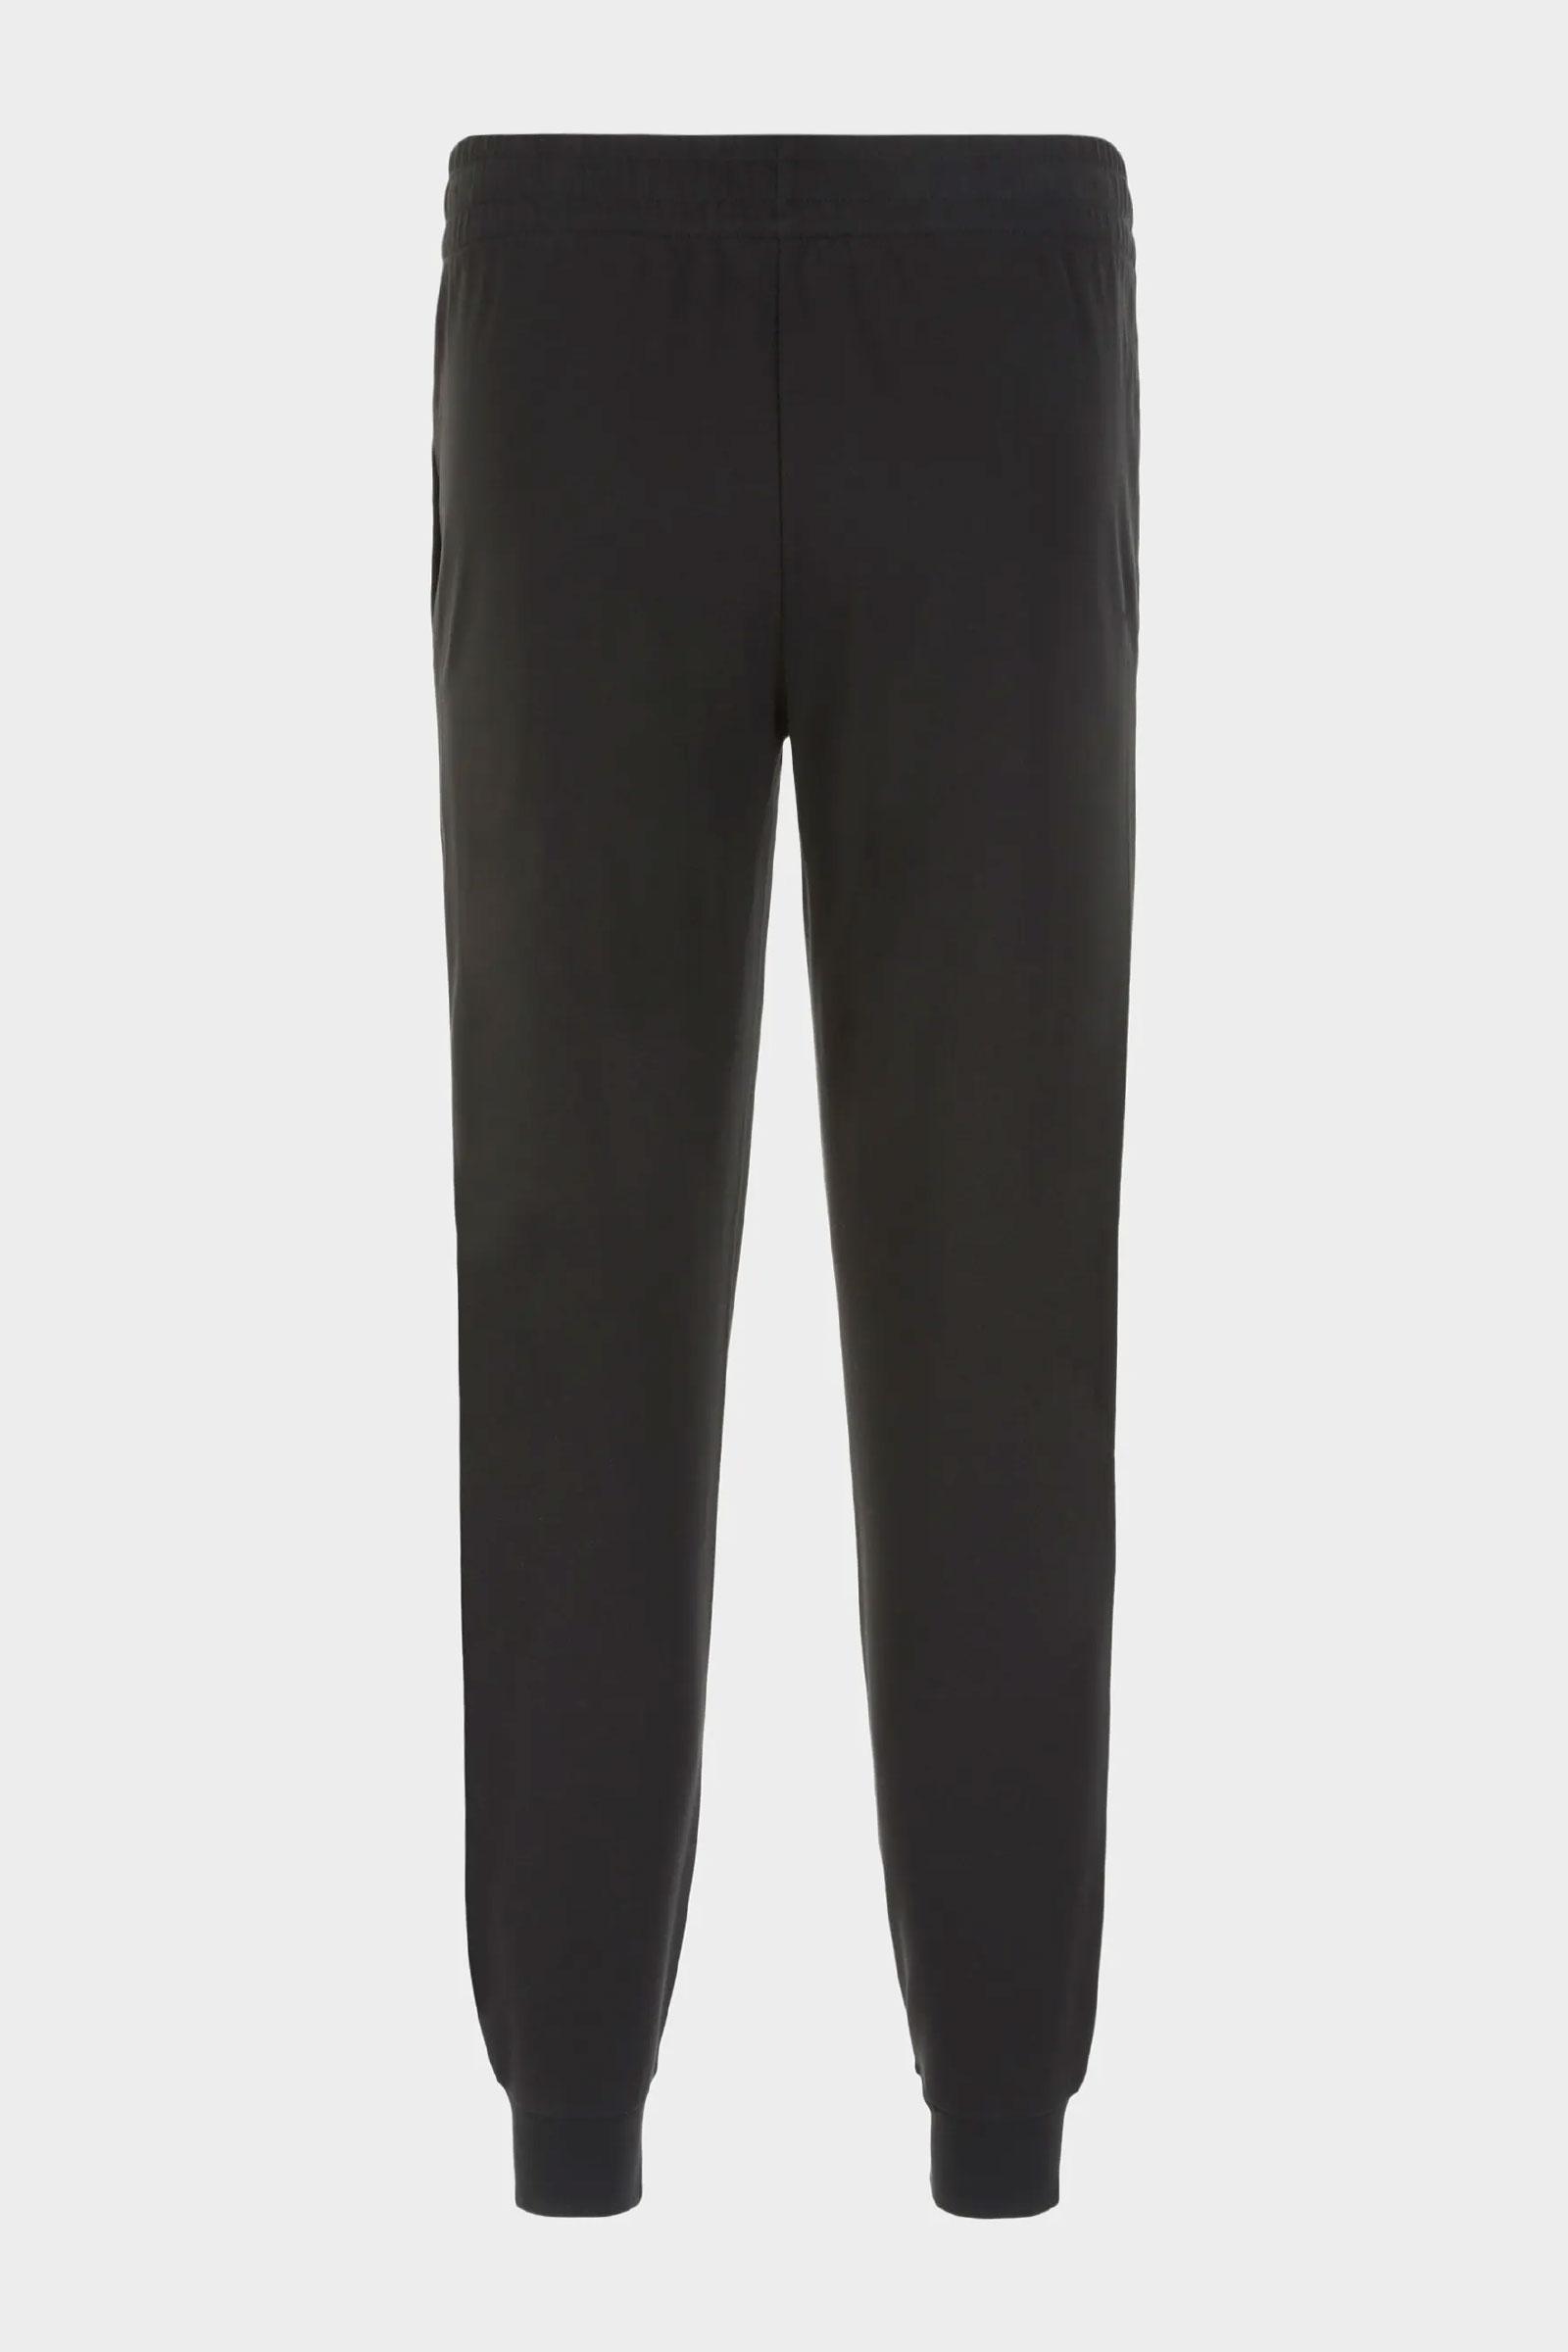 Pantalone Uomo ARMANI EA7   Pantalone   6KPP68 PJBWZ1200